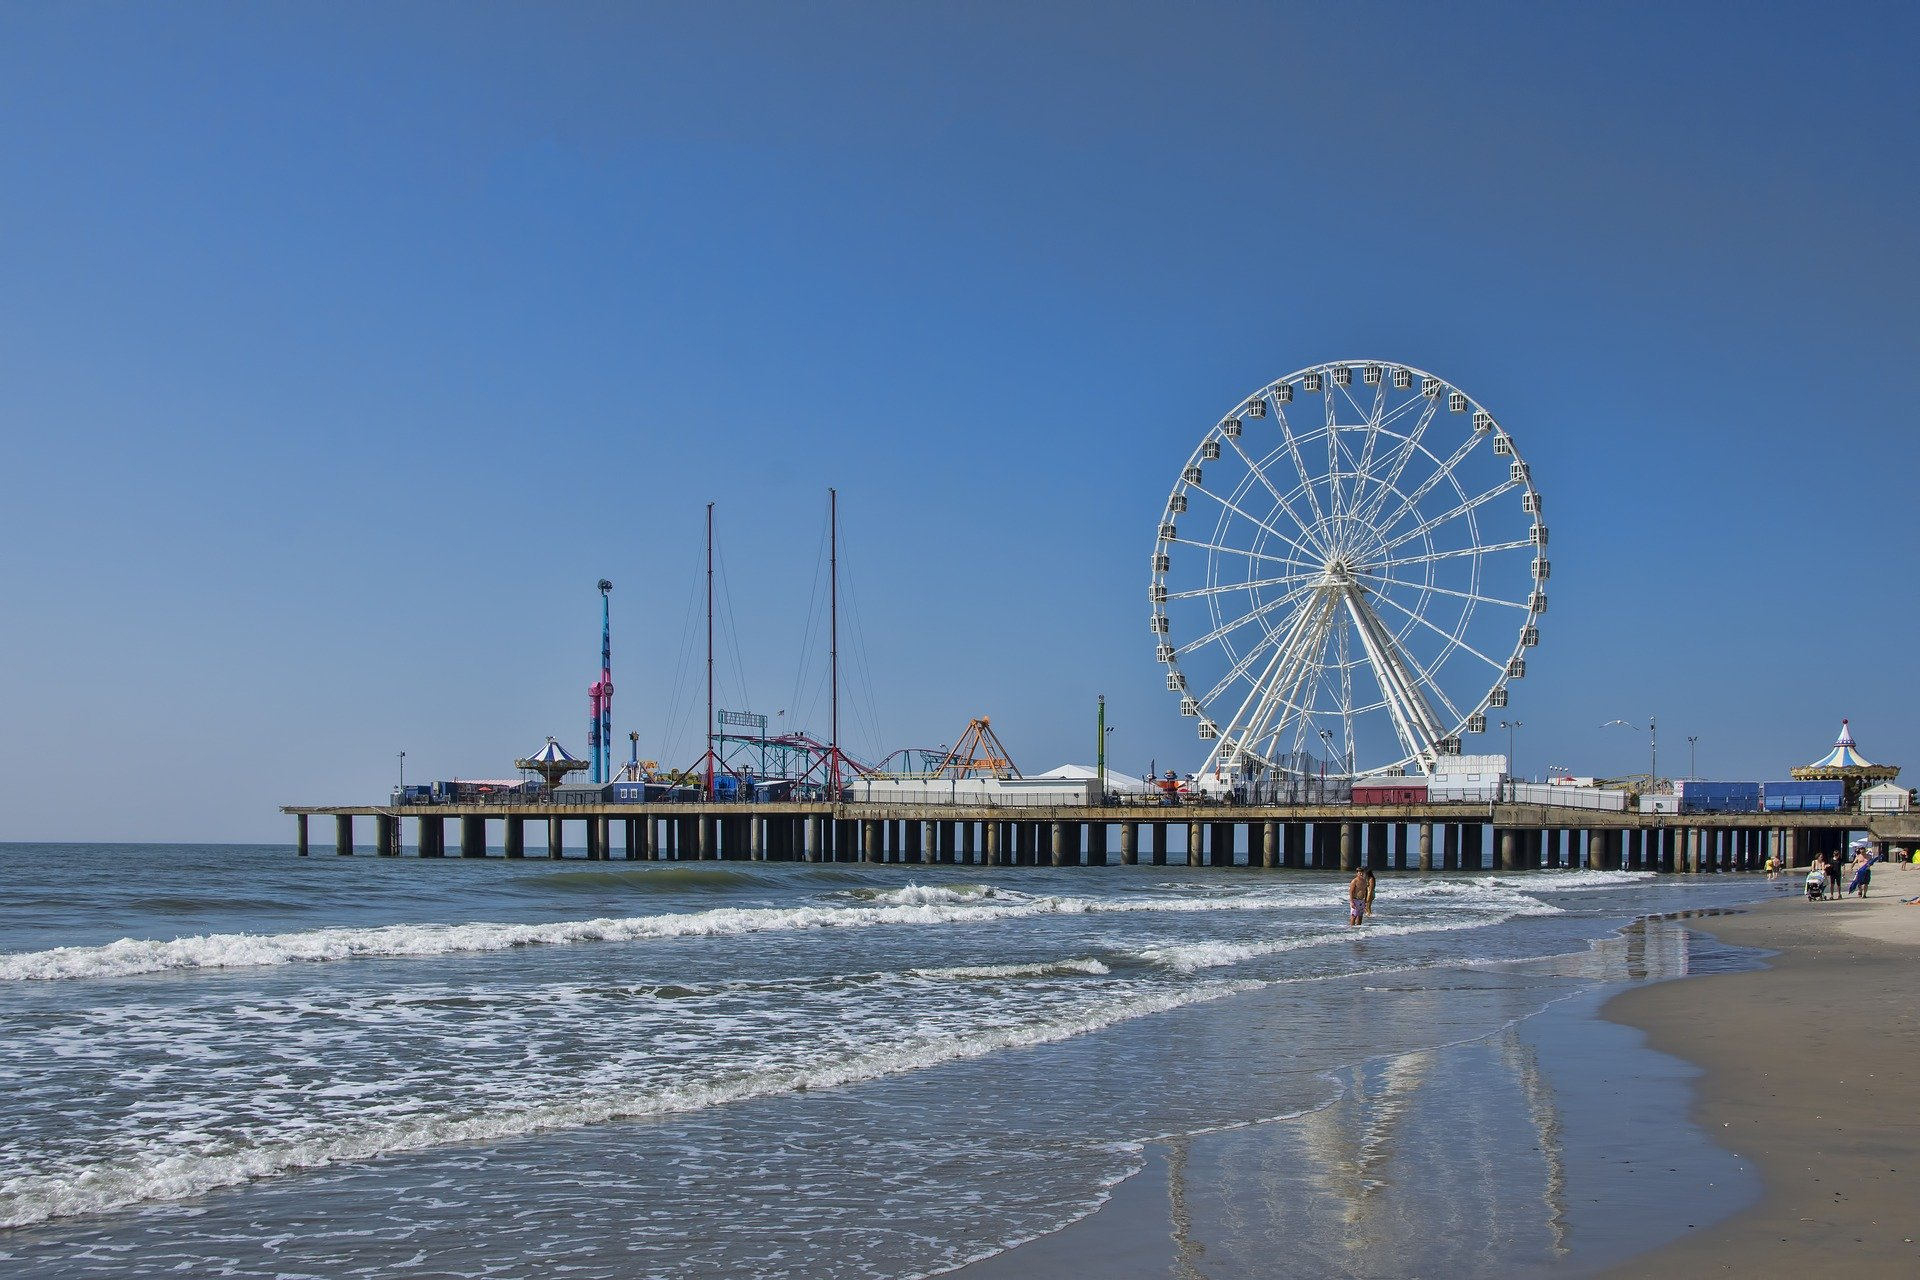 Top Attraction to Visit in Atlantic City-The Steel Pier